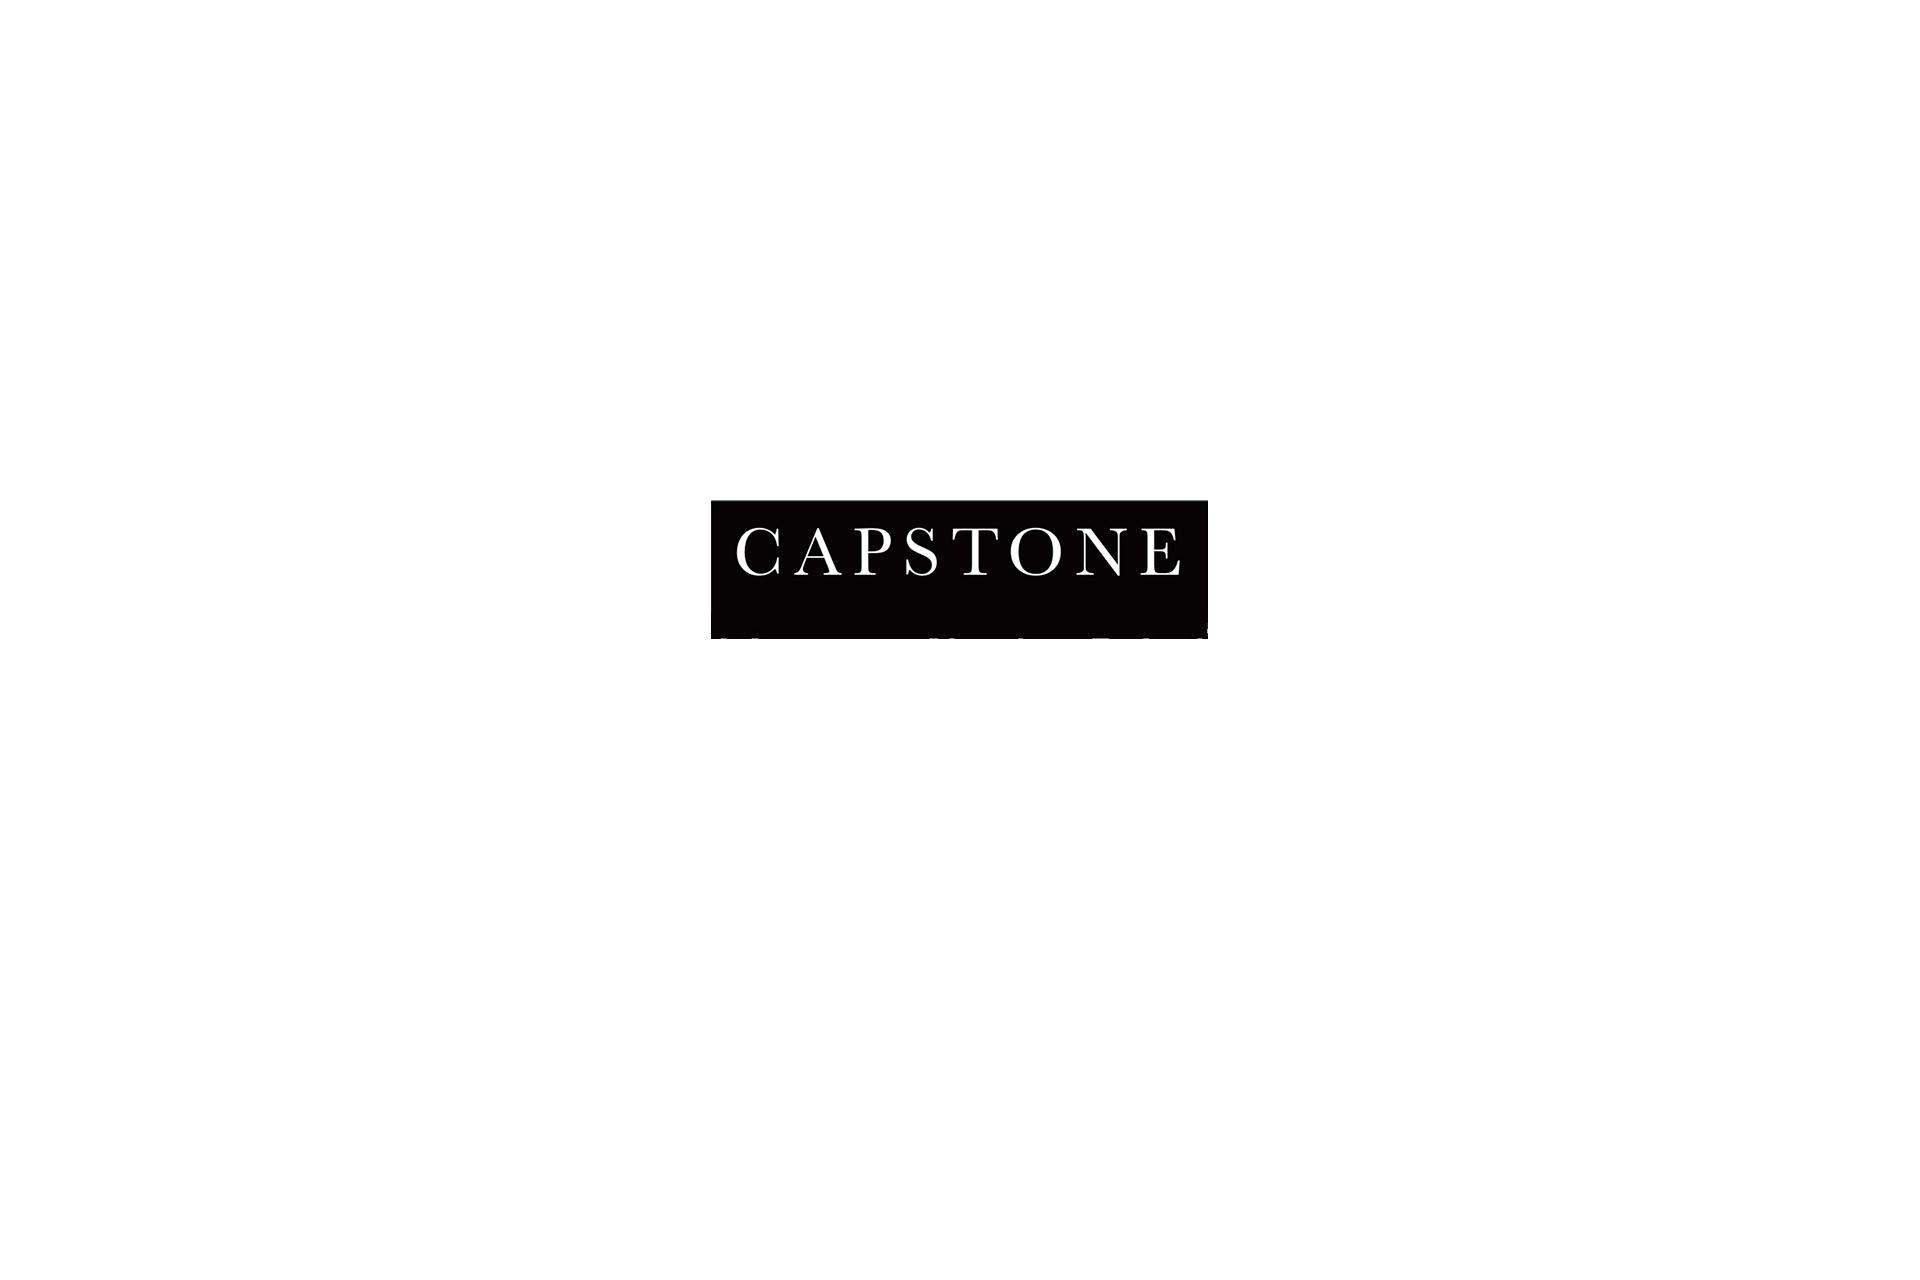 Capstone Compliance Services